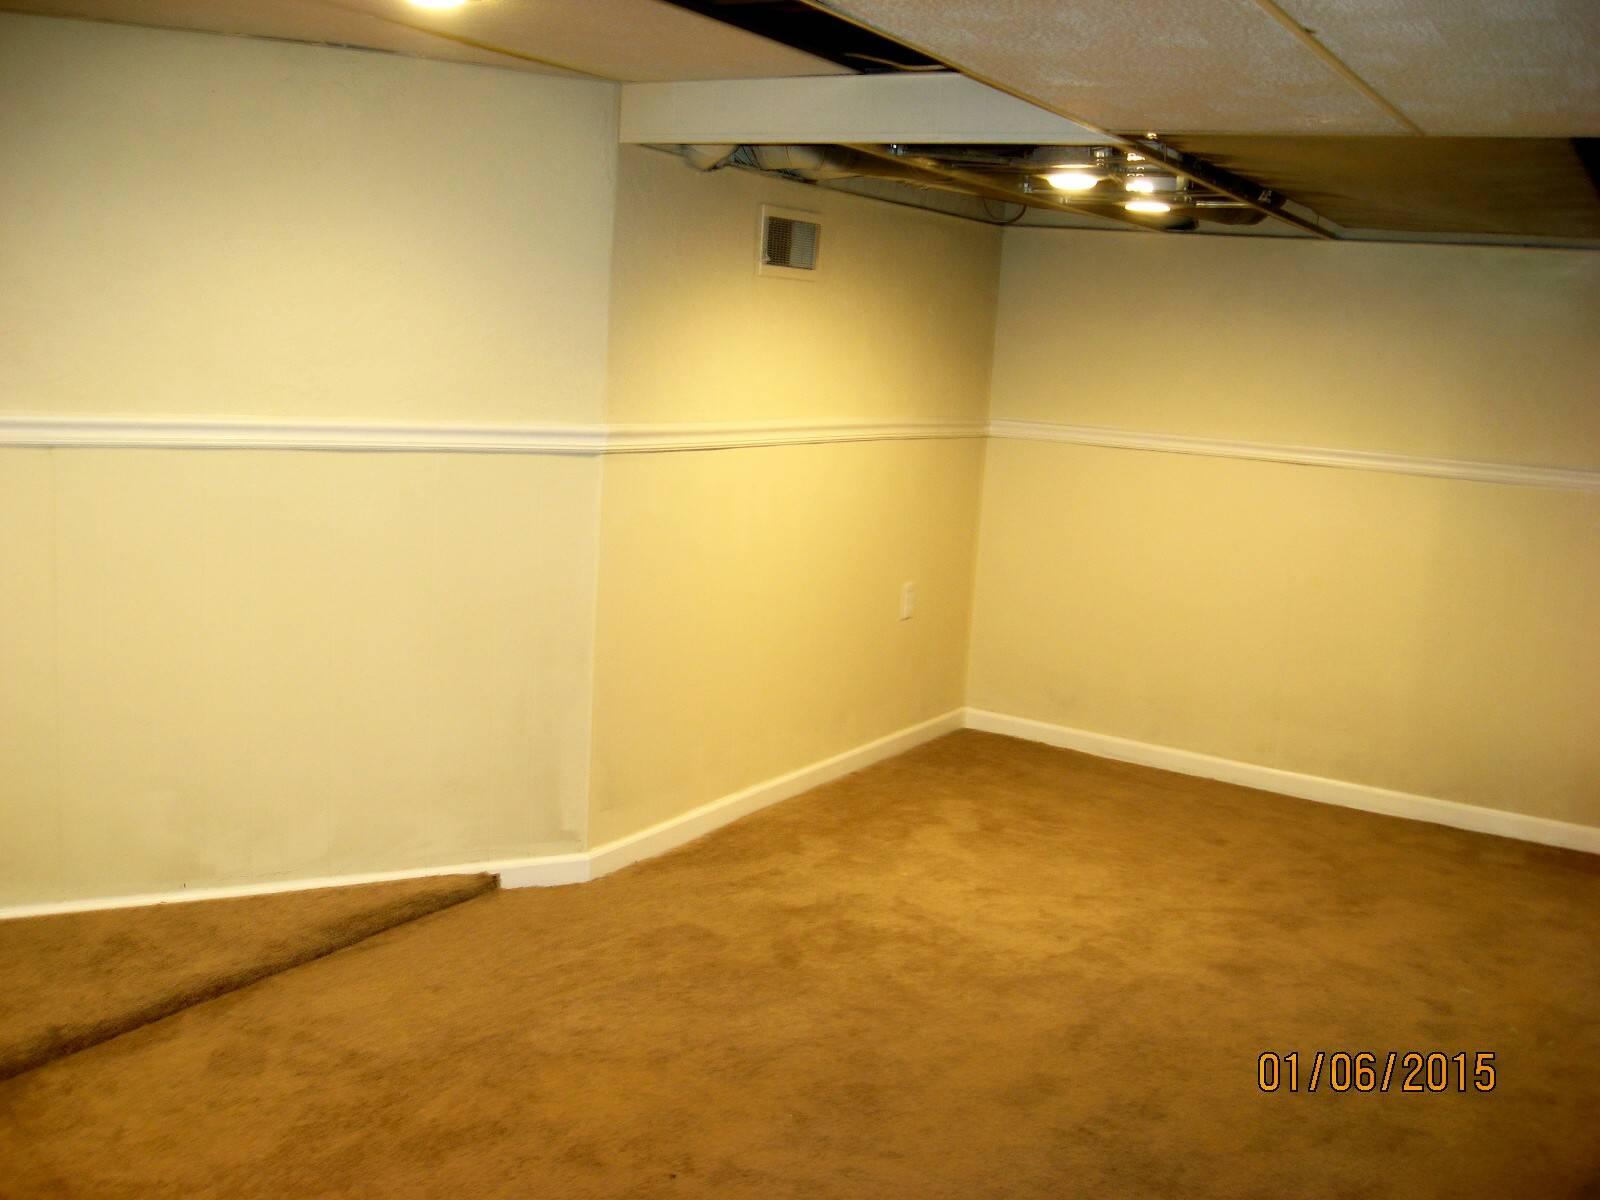 2384 24th st moline illinois 4 bedrooms 3 full bat for Hardwood floors quad cities